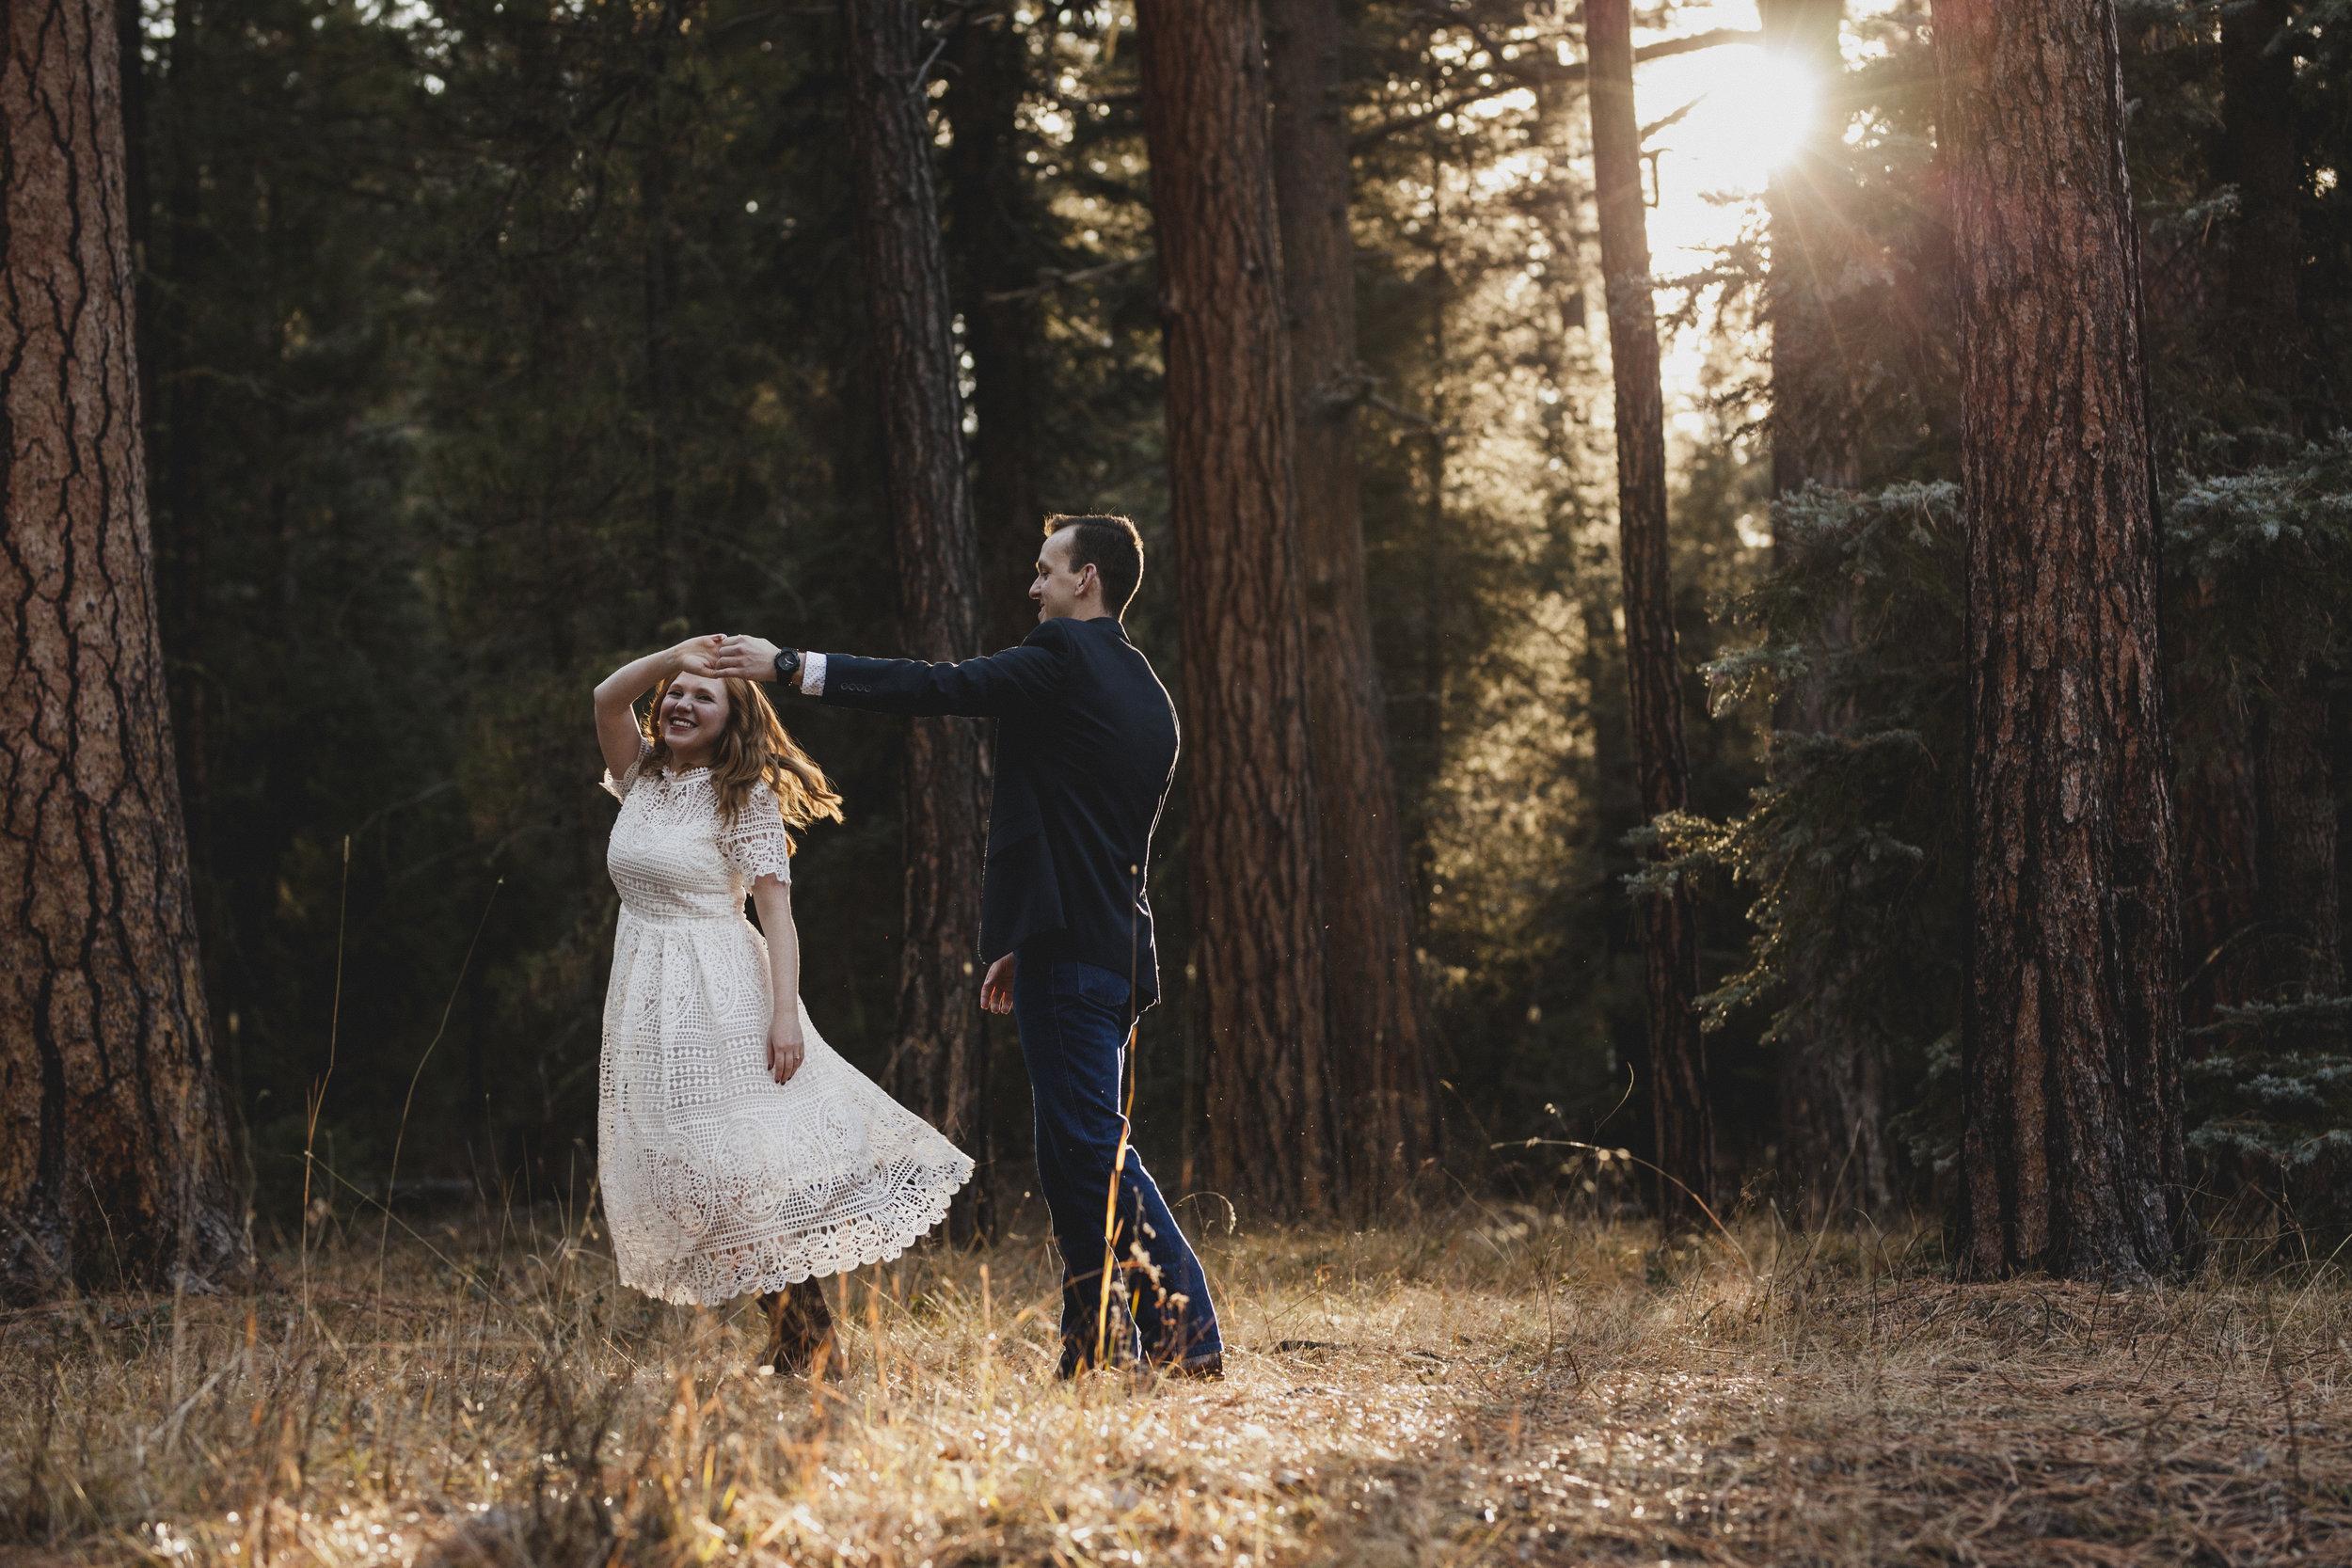 AB-LeahandAshtonphotography-Pagosa-Springs-Telluride-Wedding--8135.jpg